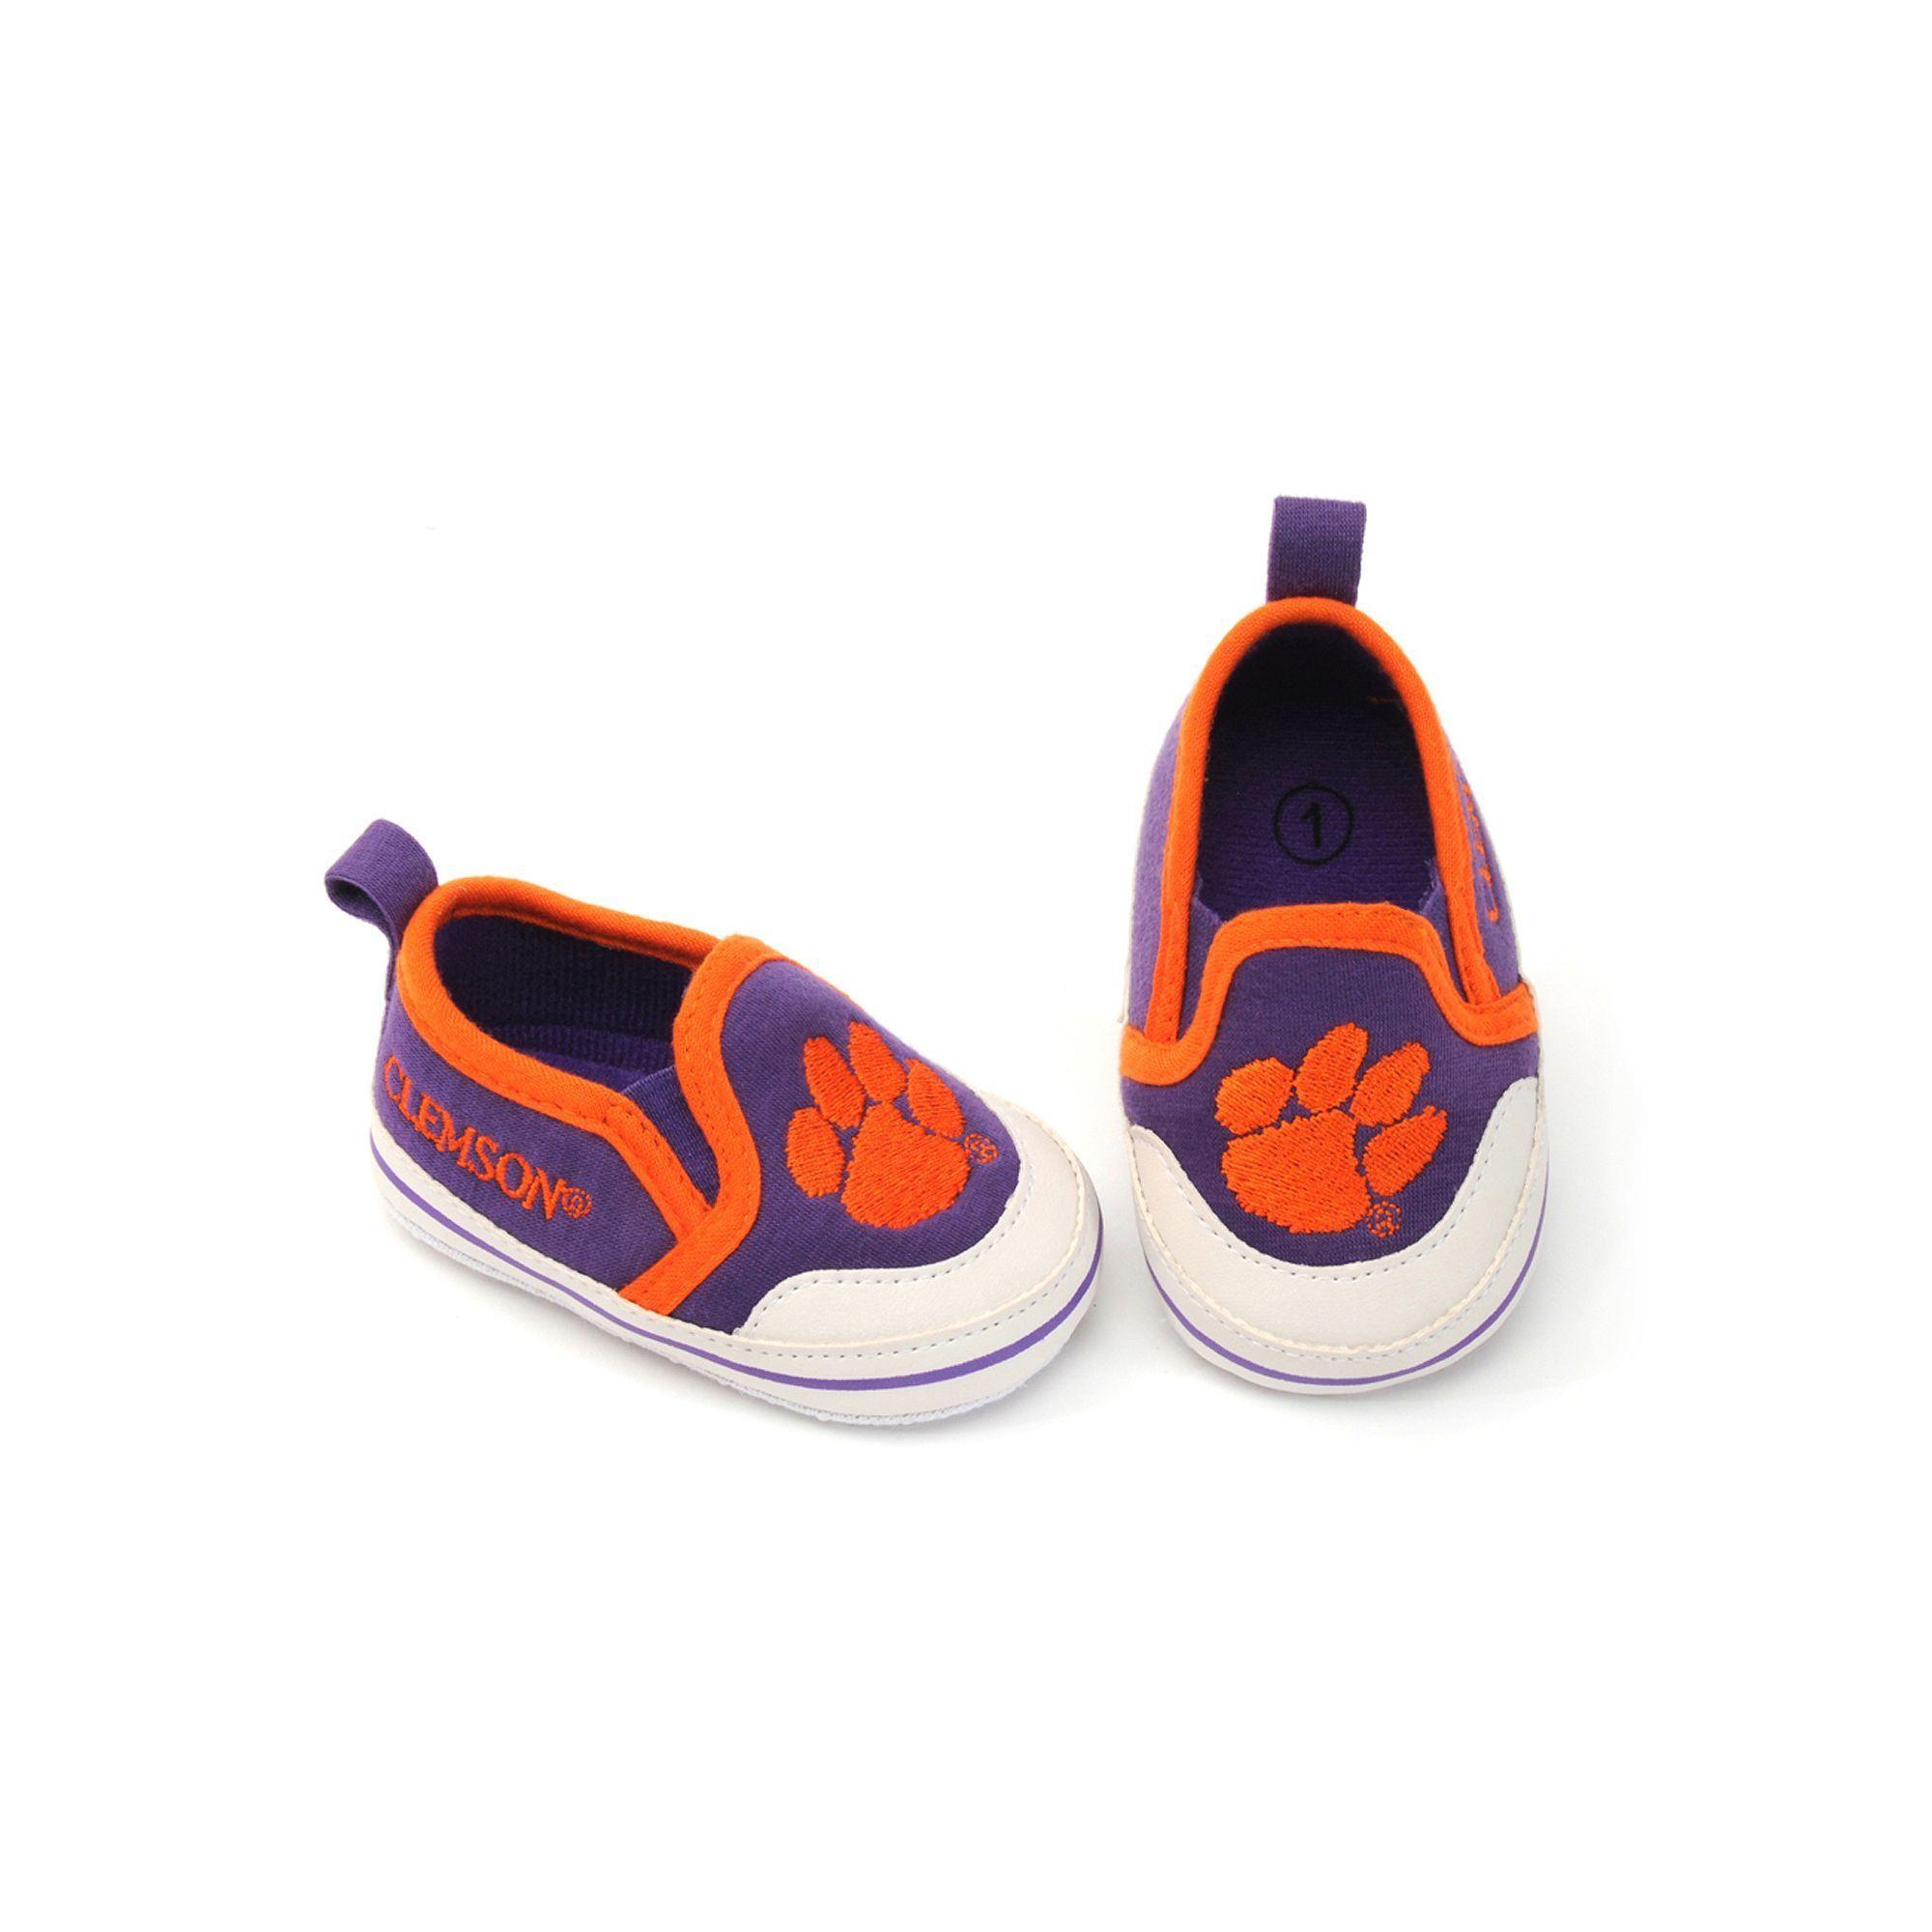 Baby Clemson Tigers Crib Shoes Infant Uni Size 0 3 Months